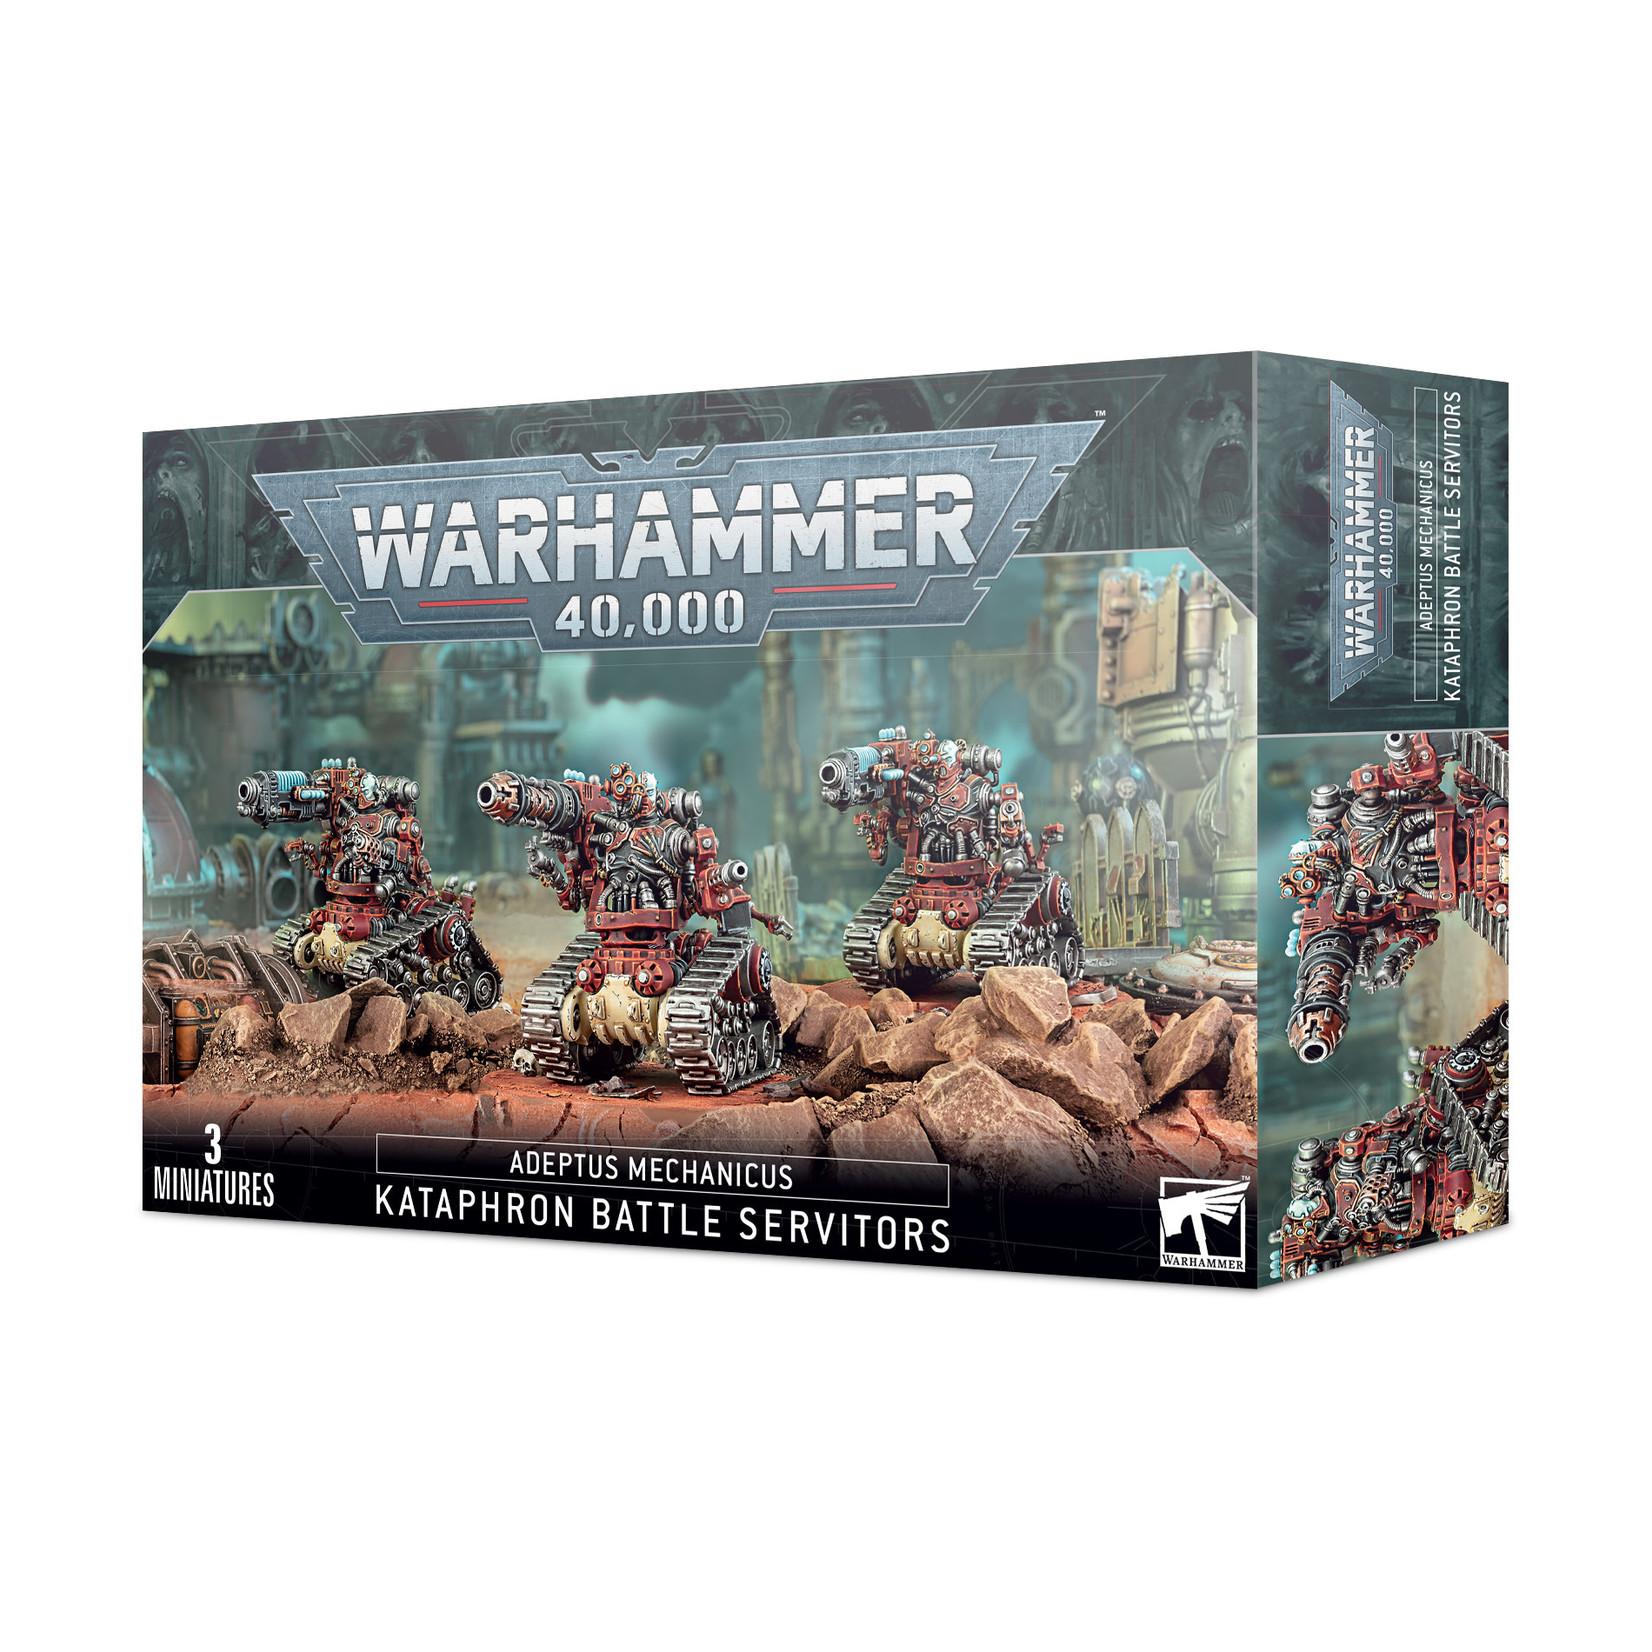 Games Workshop Warhammer 40k: Adeptus Mechanicus - Kataphron Battle Servitors